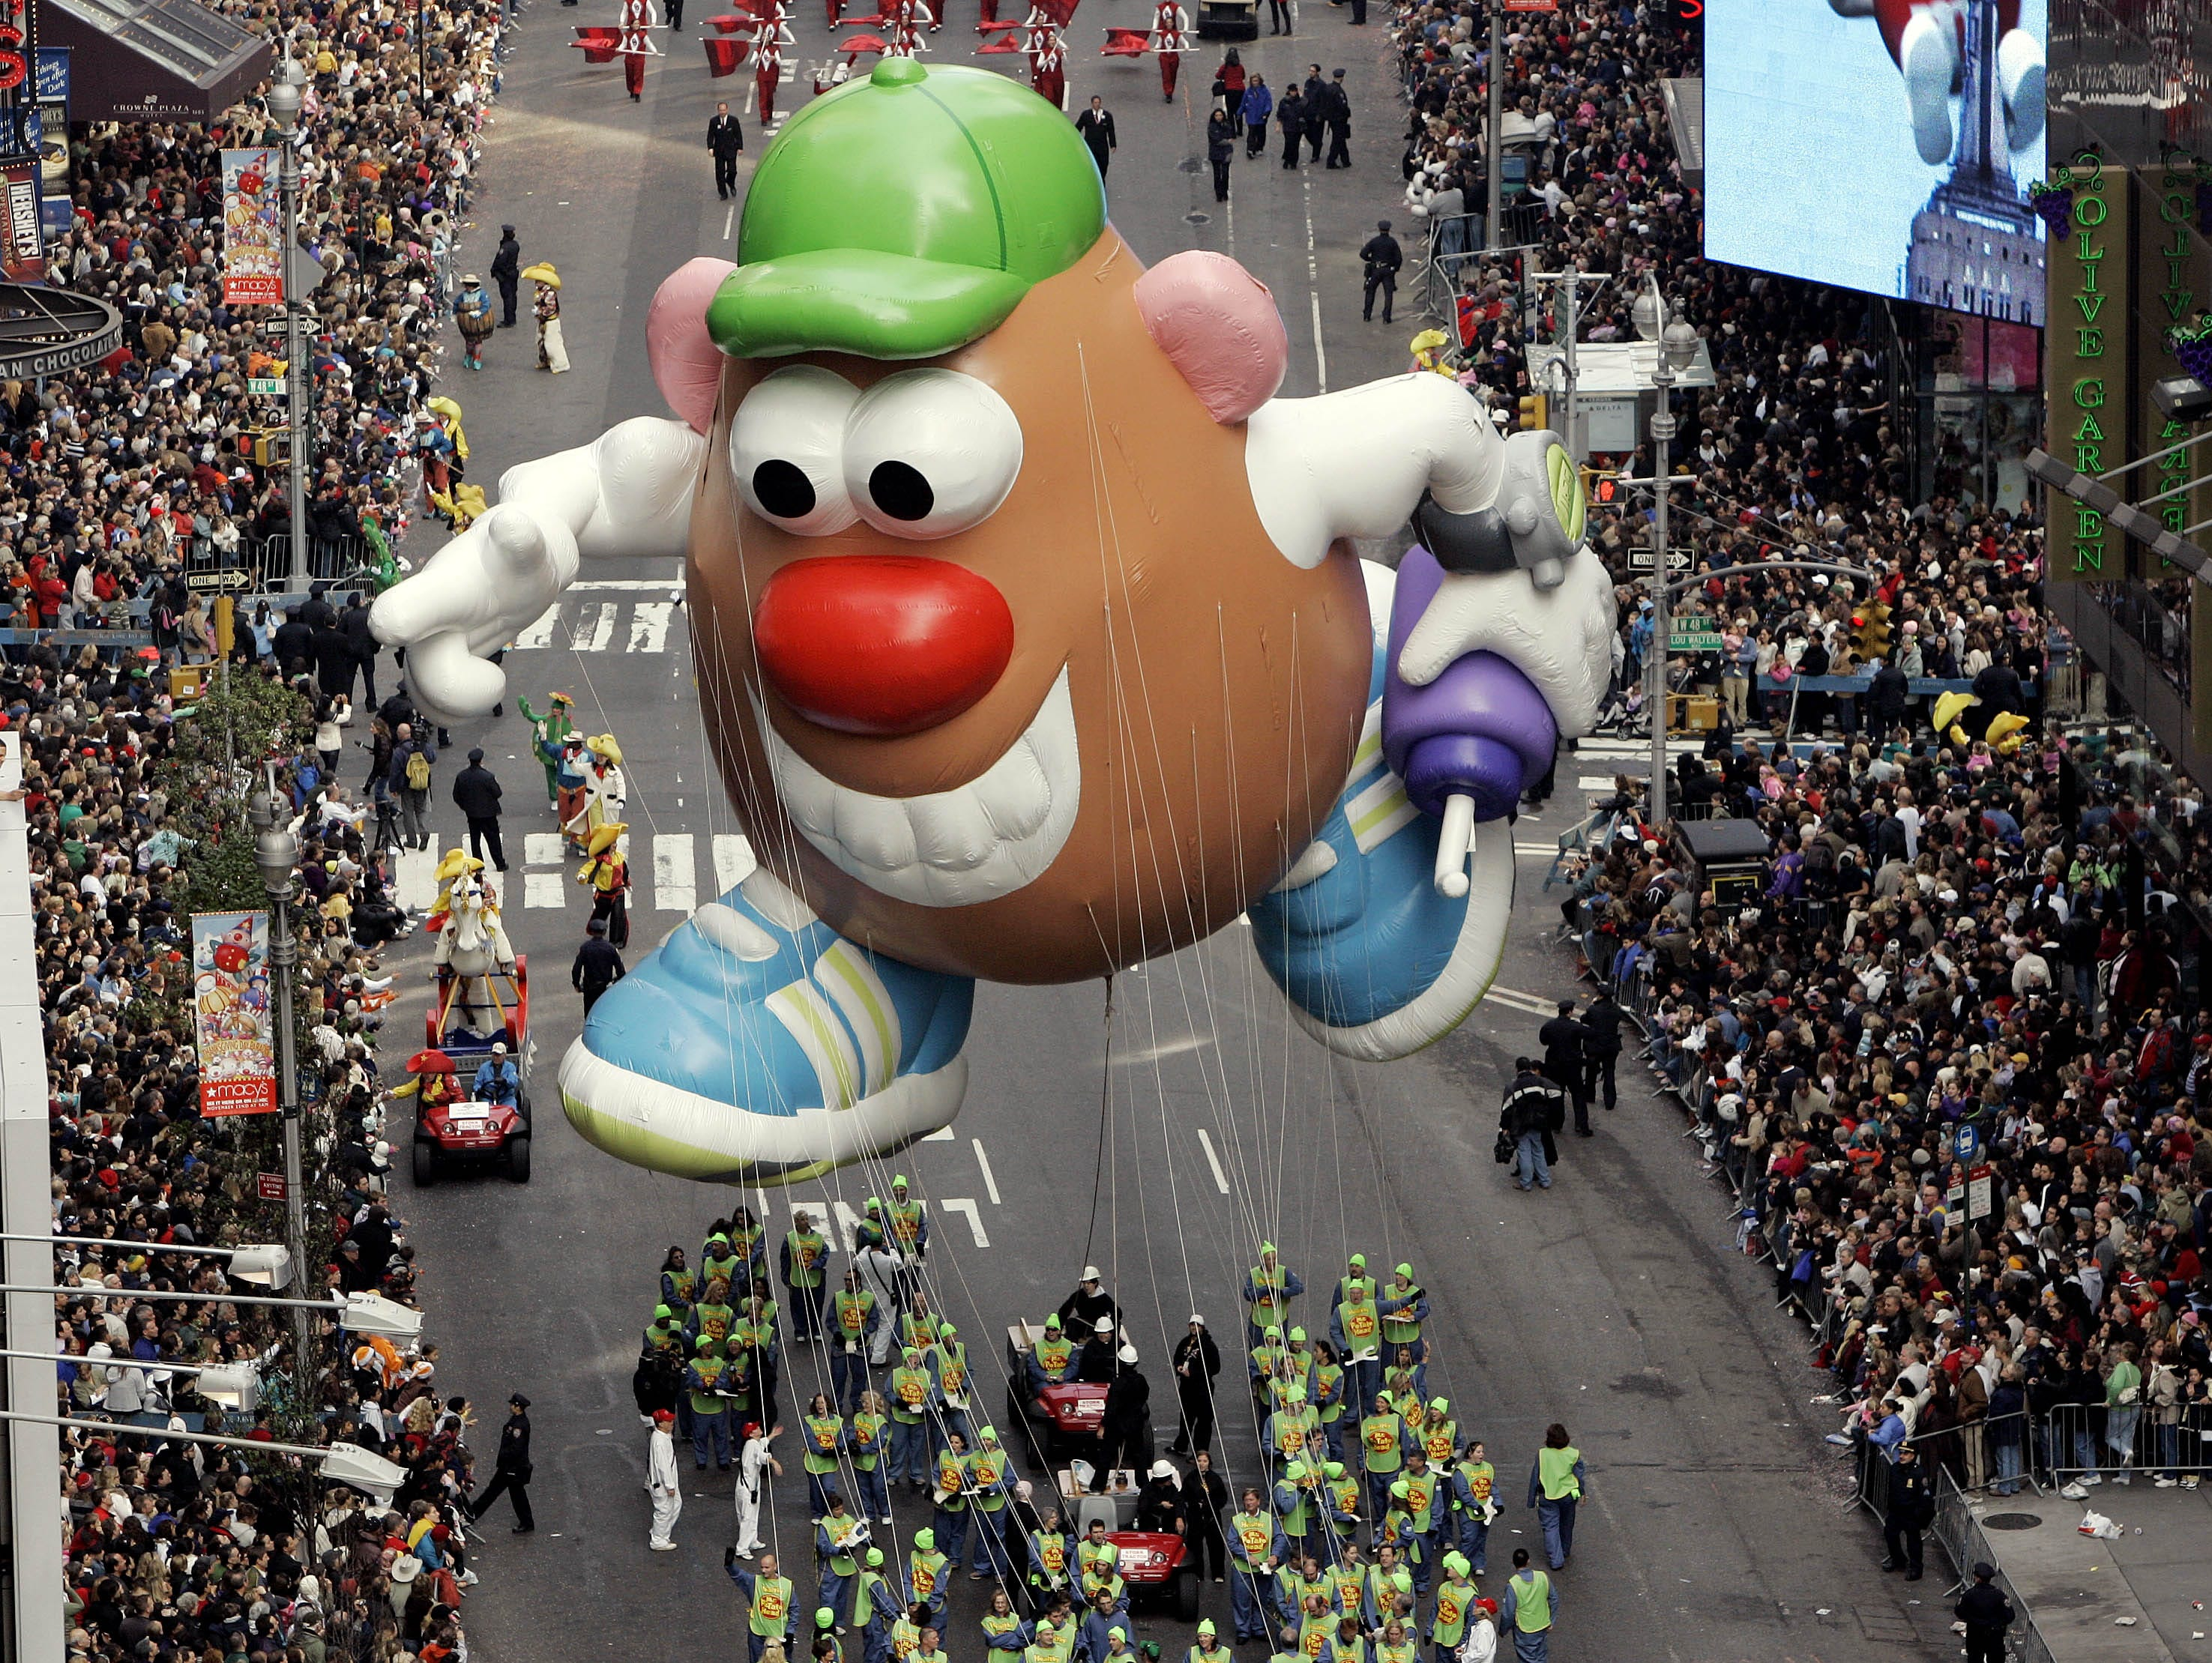 The Mr. Potato Head  balloon floats down Broadway during the Macy's Thanksgiving Day parade in New York, Thursday, Nov. 22, 2007. (AP Photo/Jeff Christensen)